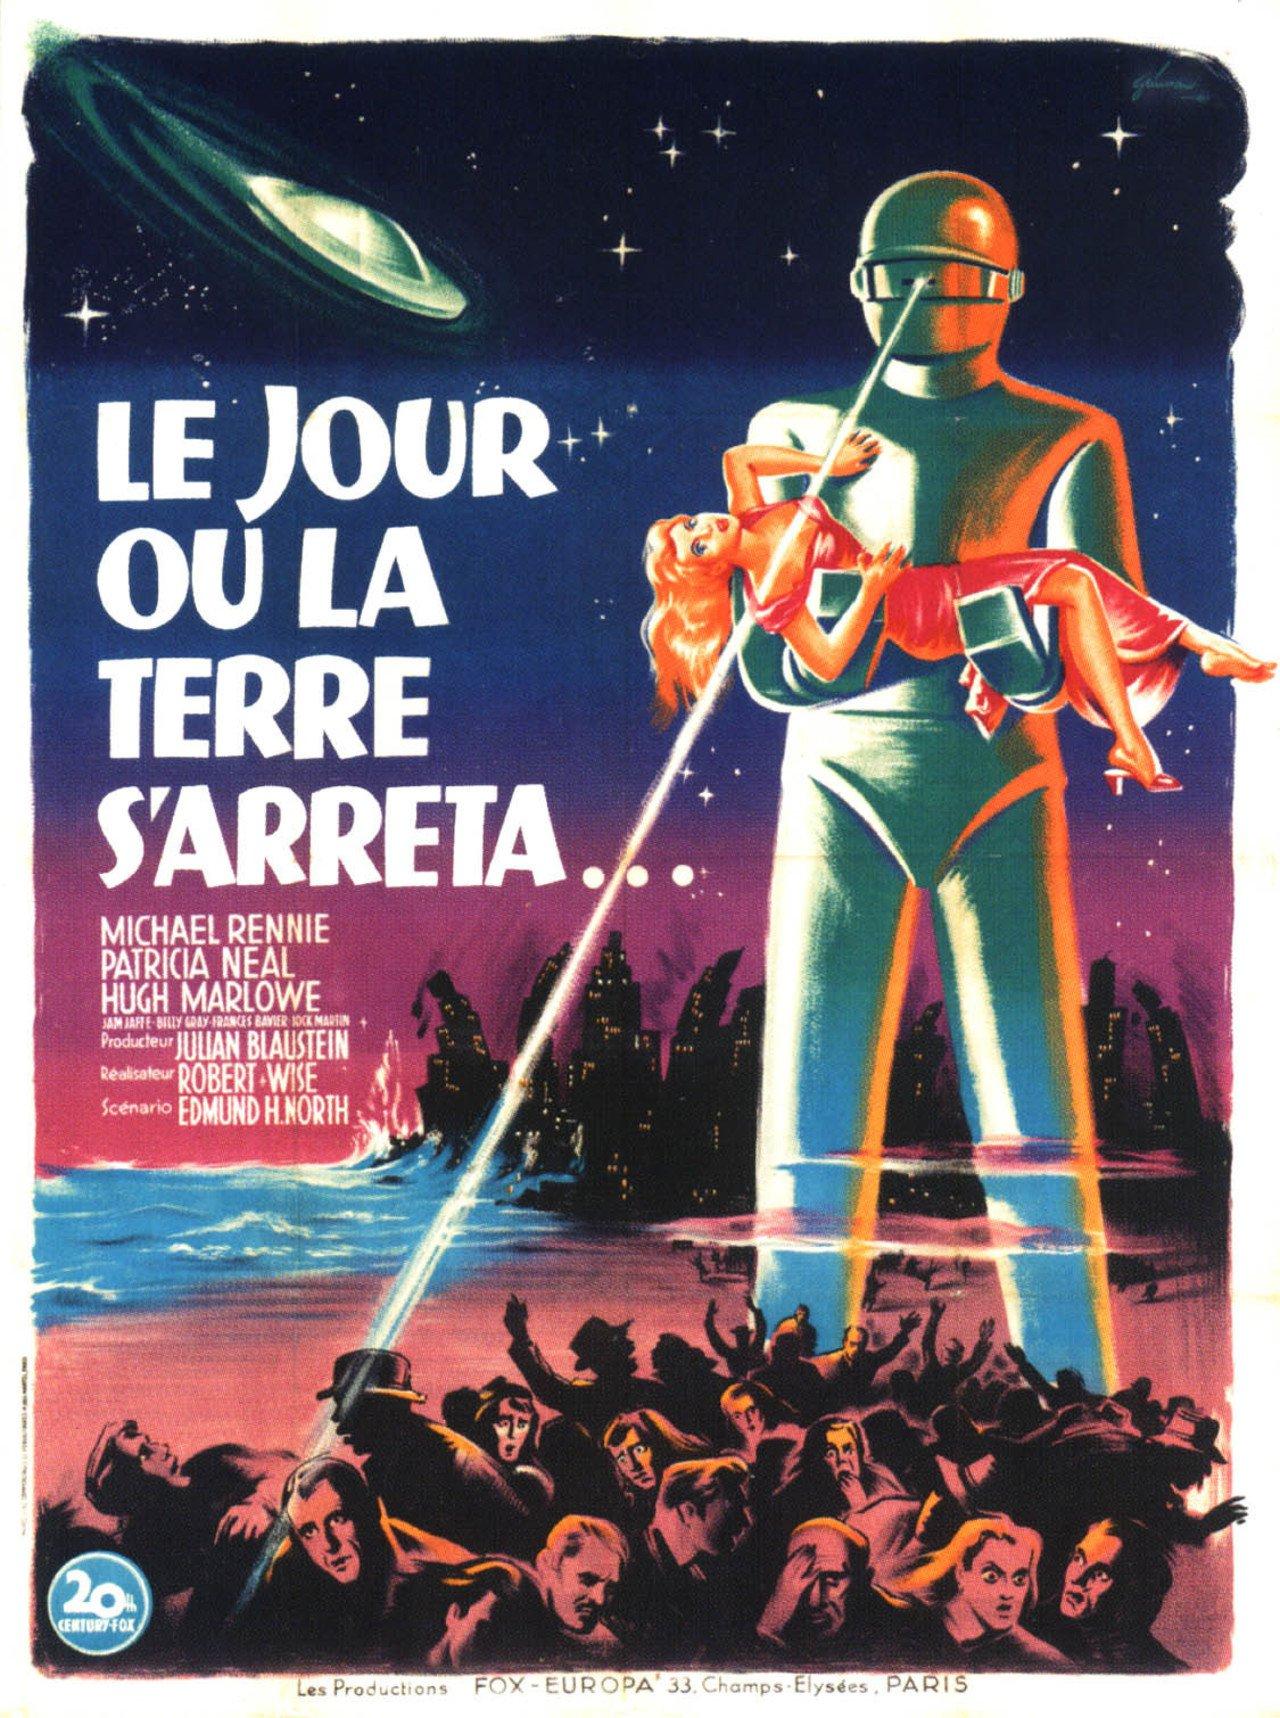 le-jour-ou-la-terre-sarreta-affiche-filmosphere